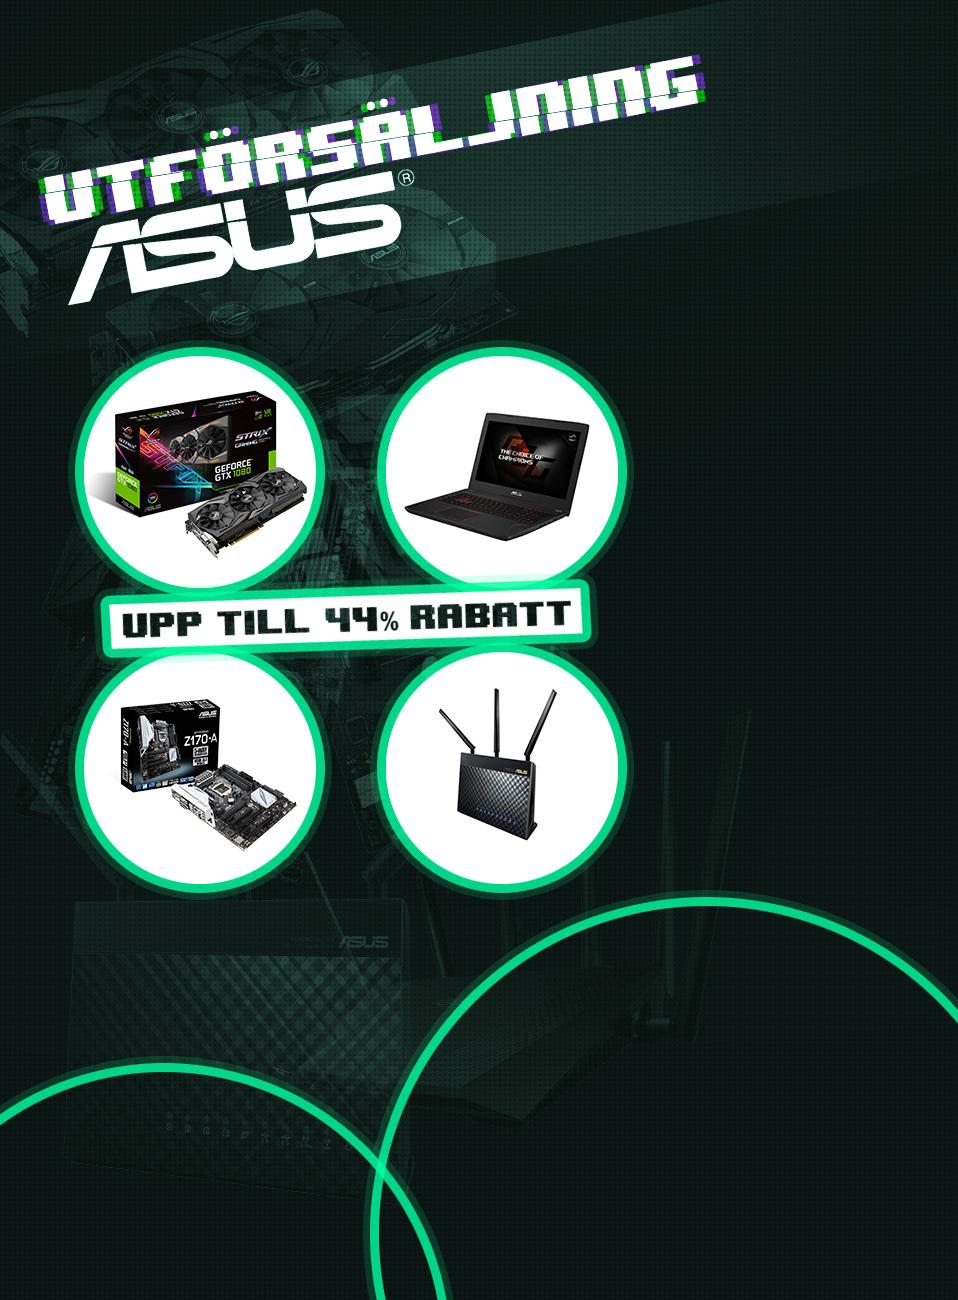 Hp color laserjet pro cp1025nw laserskrivare f rg for Mobilia webhallen